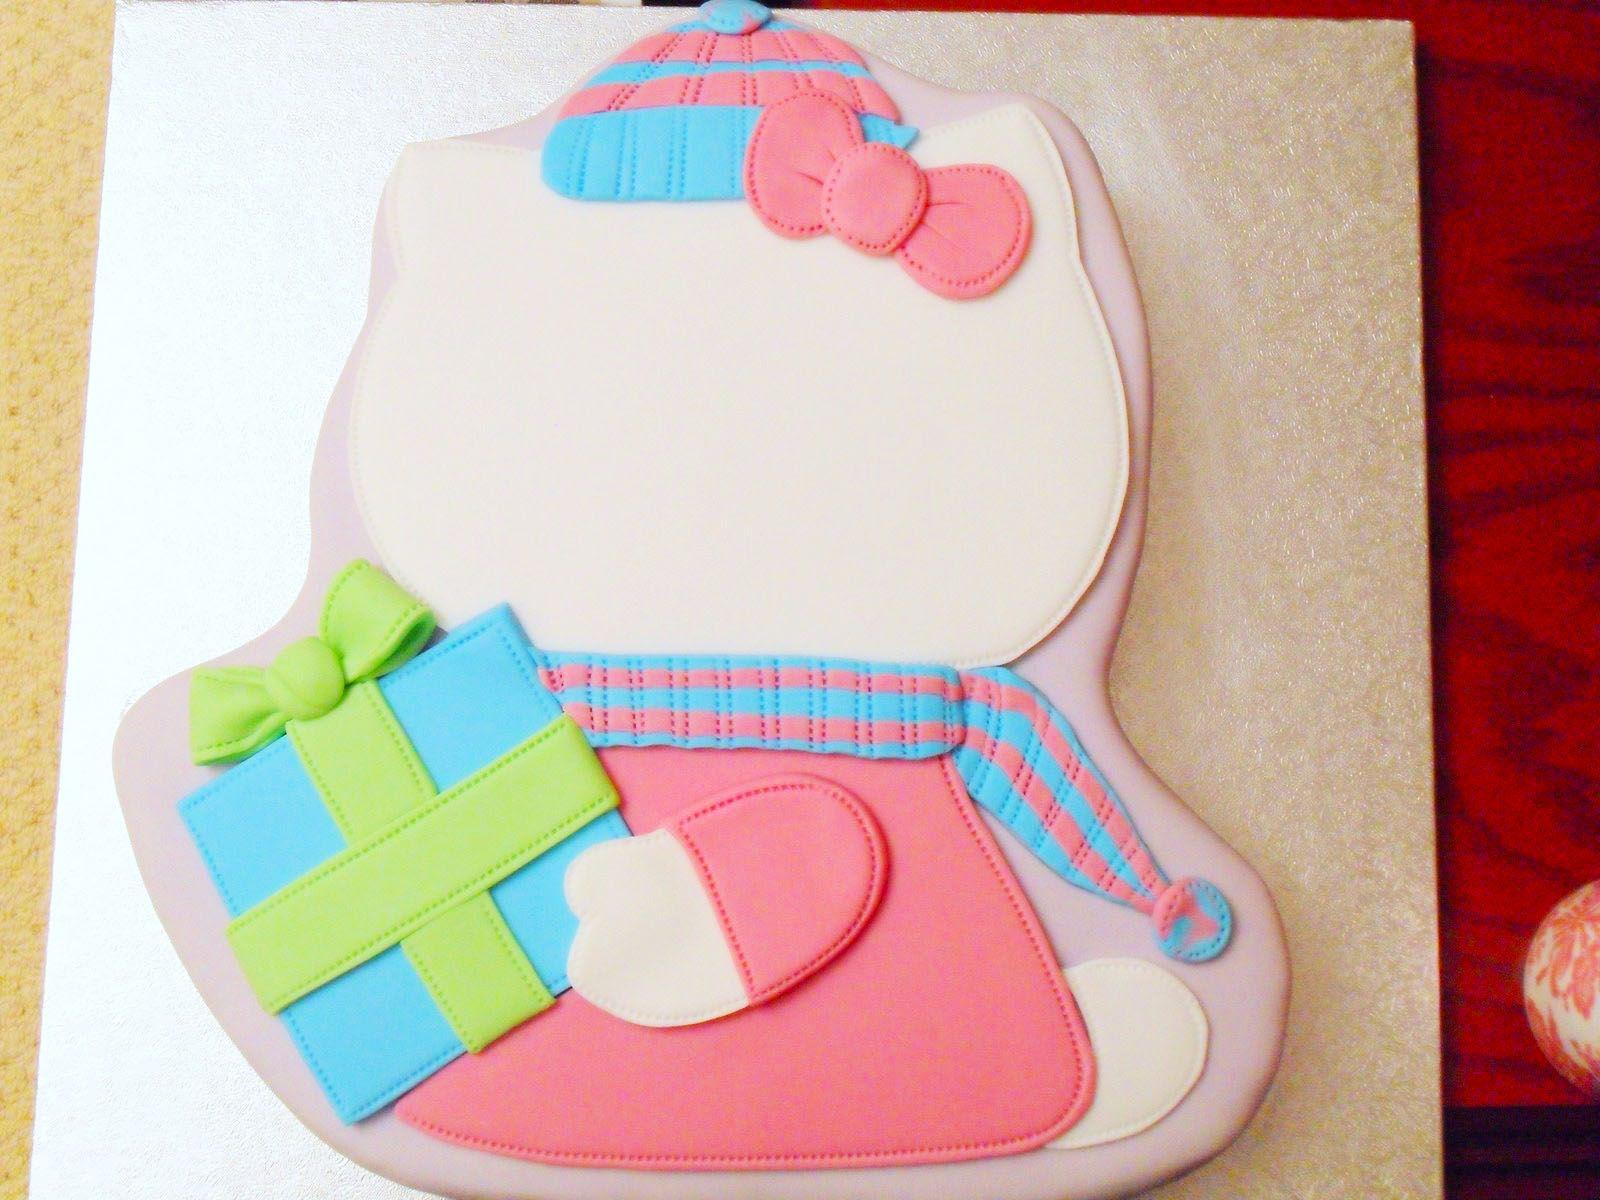 Deborah Hwang Torte: Come fare torta di Ciao Kitty